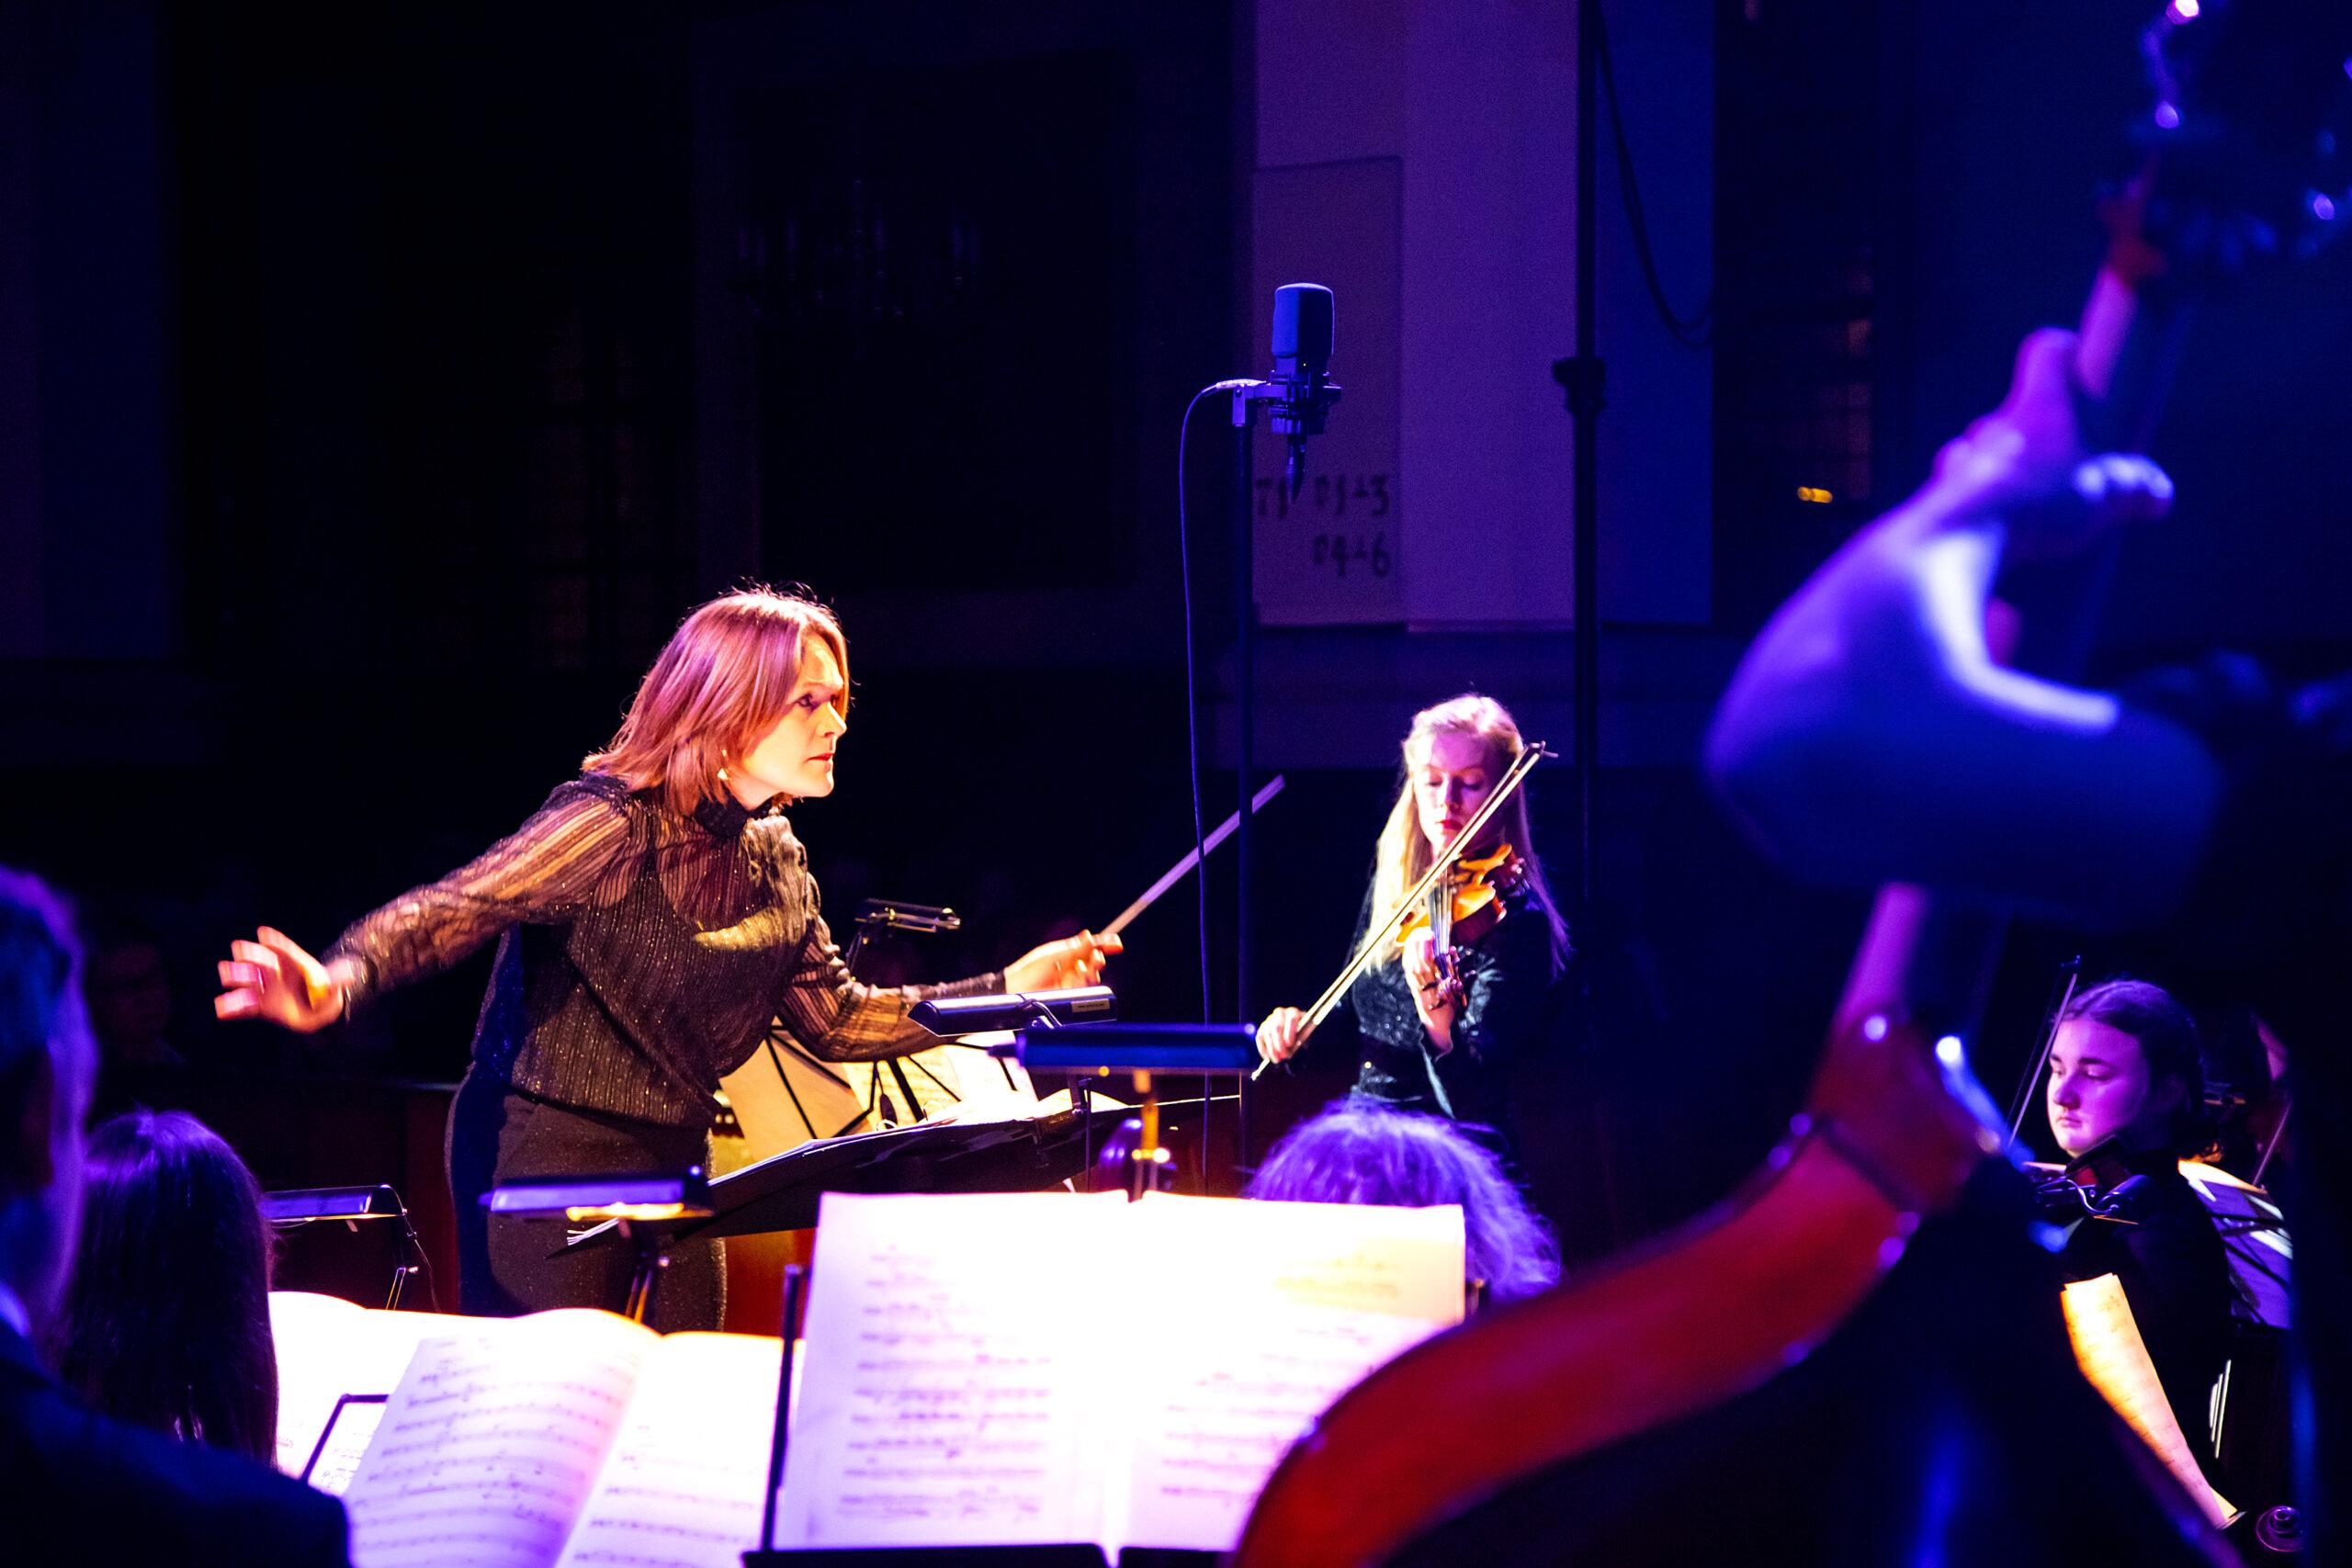 christmas koncert 2019, Helligåndskirken, Copenhagen. Foto: Jeanette Philipsen